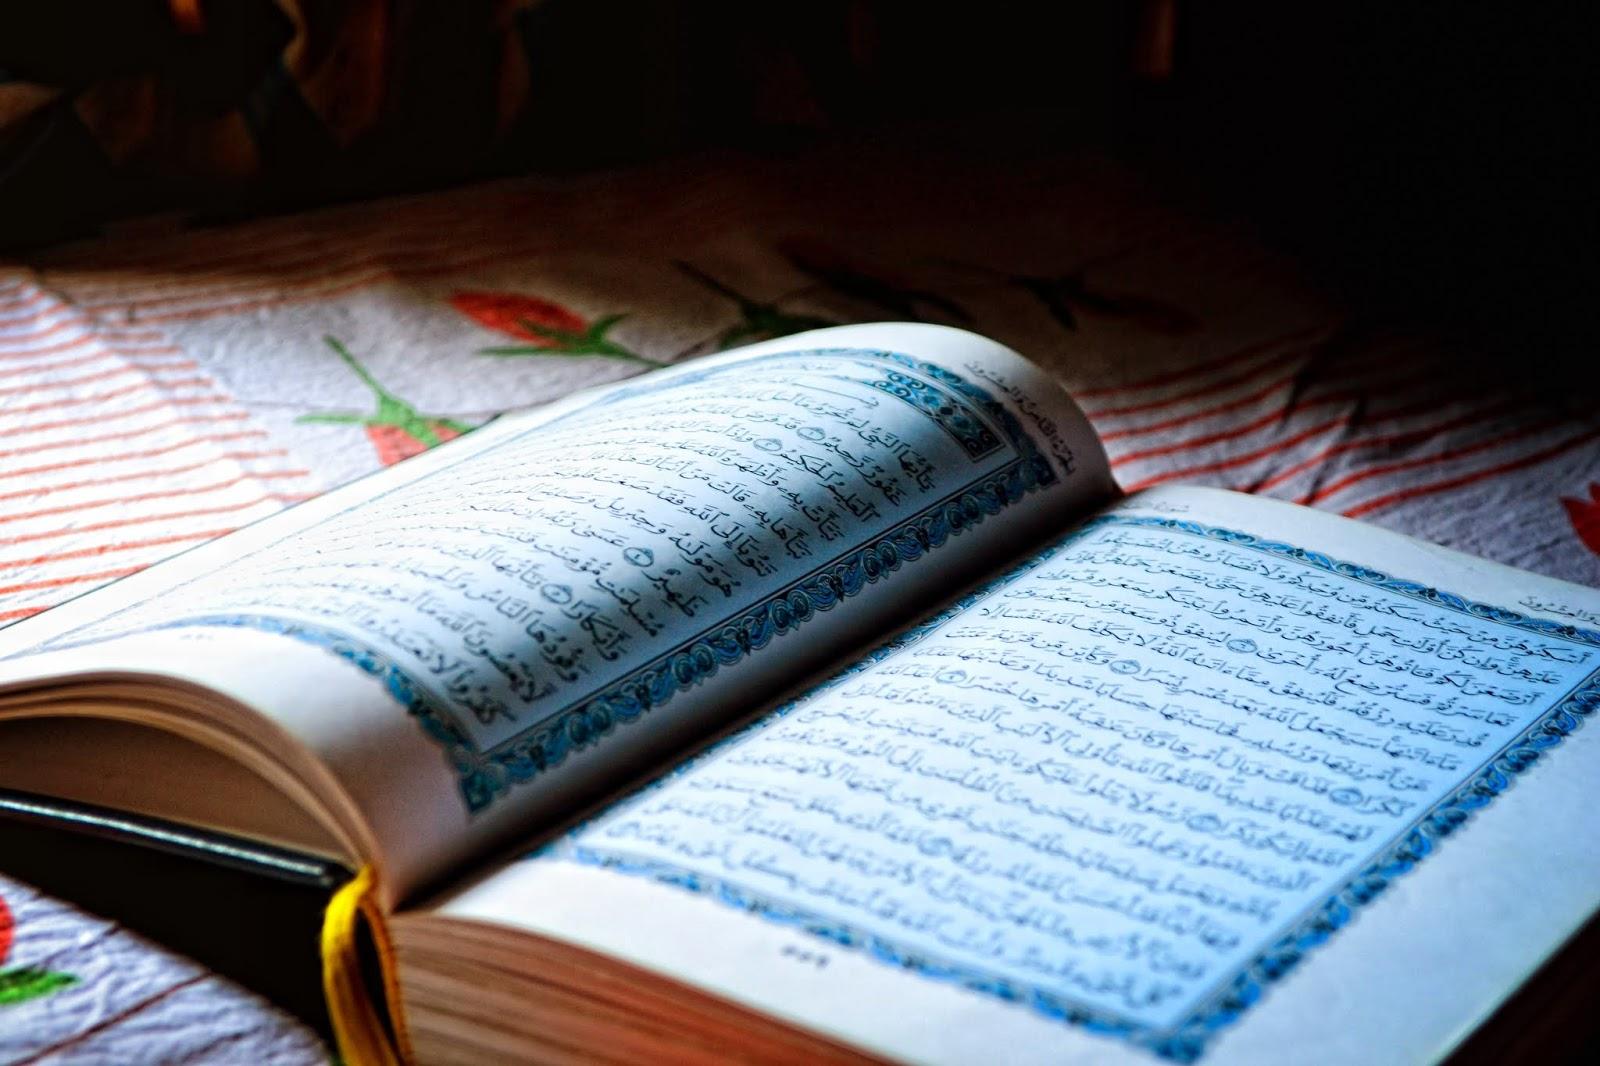 Bacaan Arab Al Quran Surat Ar Rahman Ayat 1 78 Dan Artinya